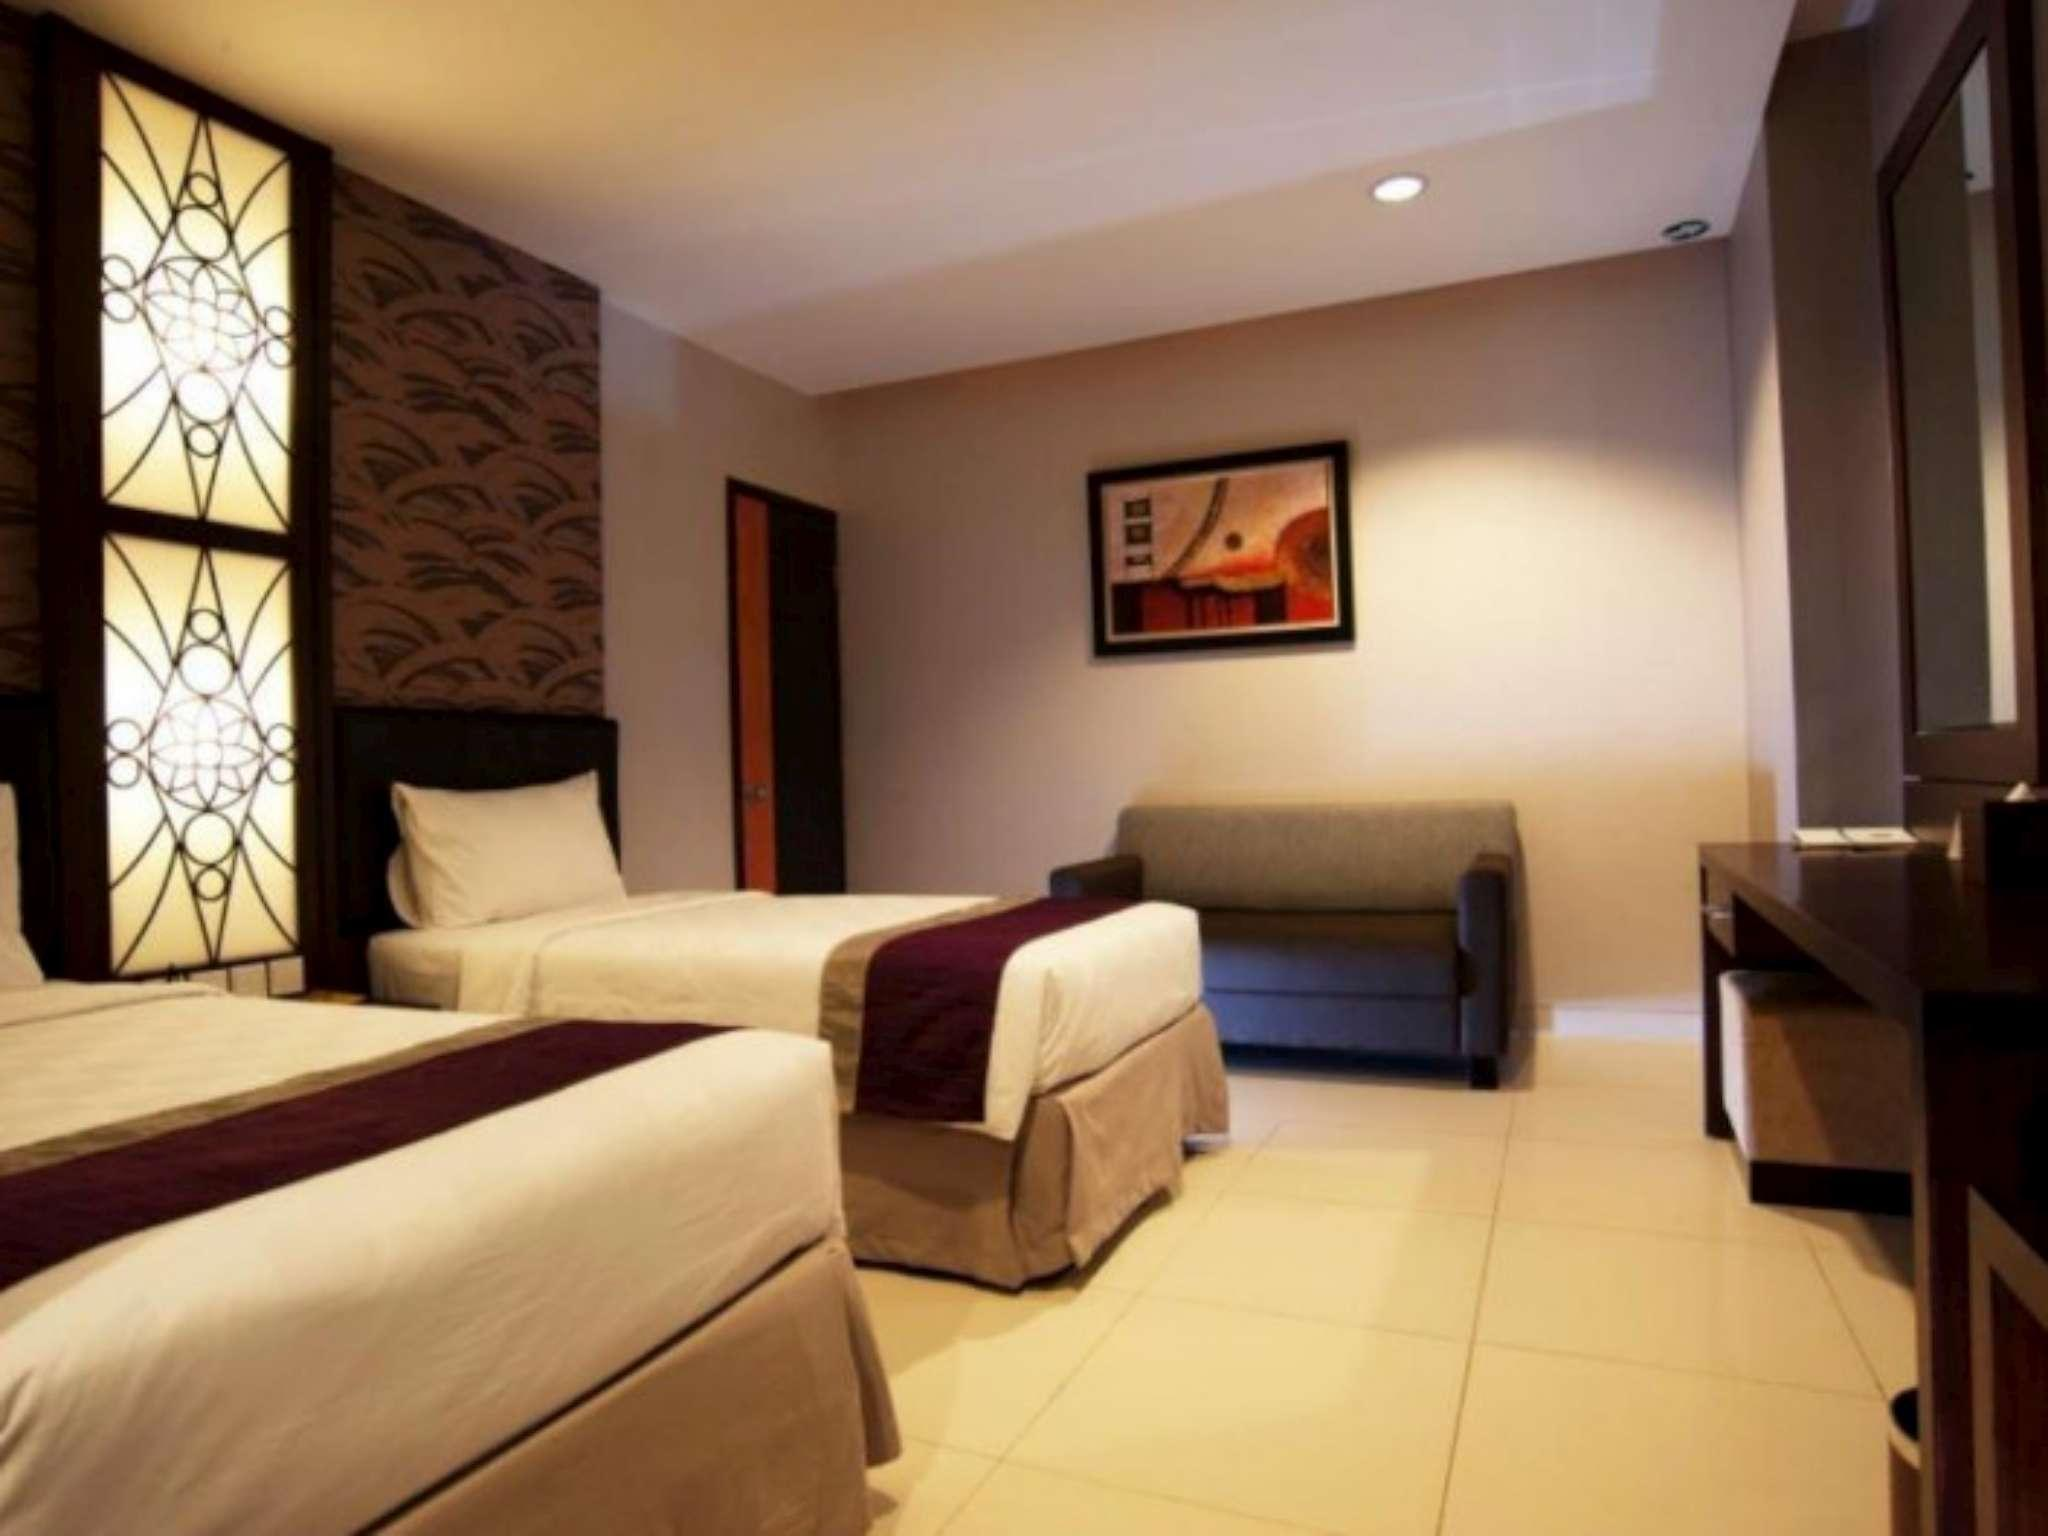 NASA Hotel In Banjarmasin